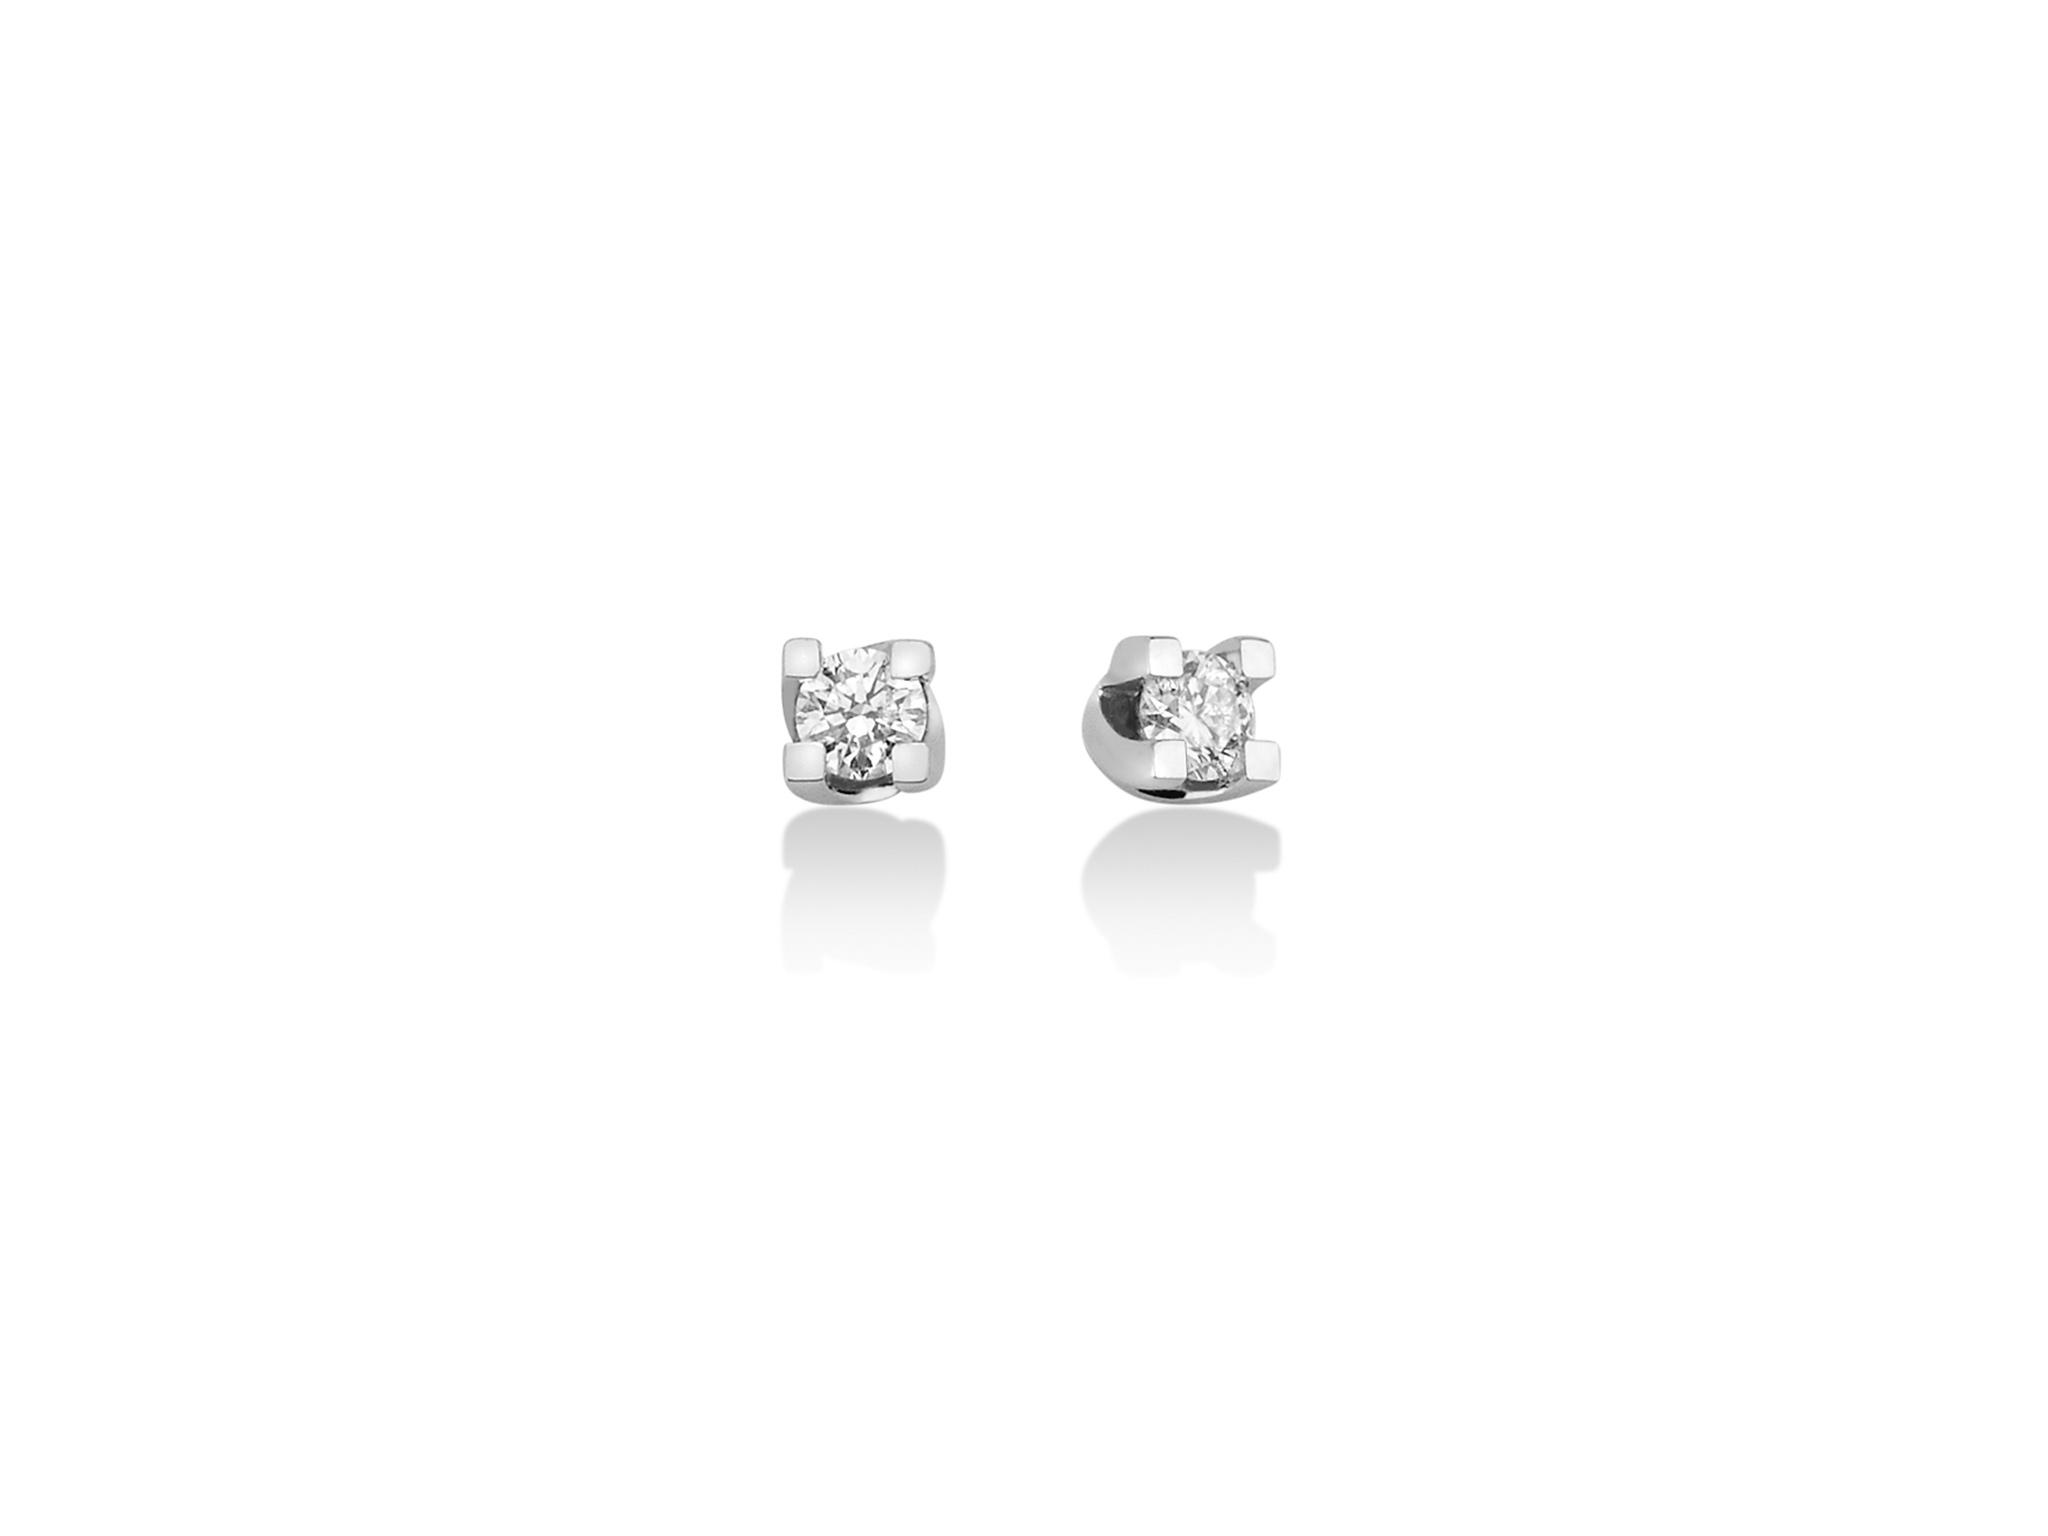 Orecchini punto luce in oro e diamanti. - ERD5068-007G7